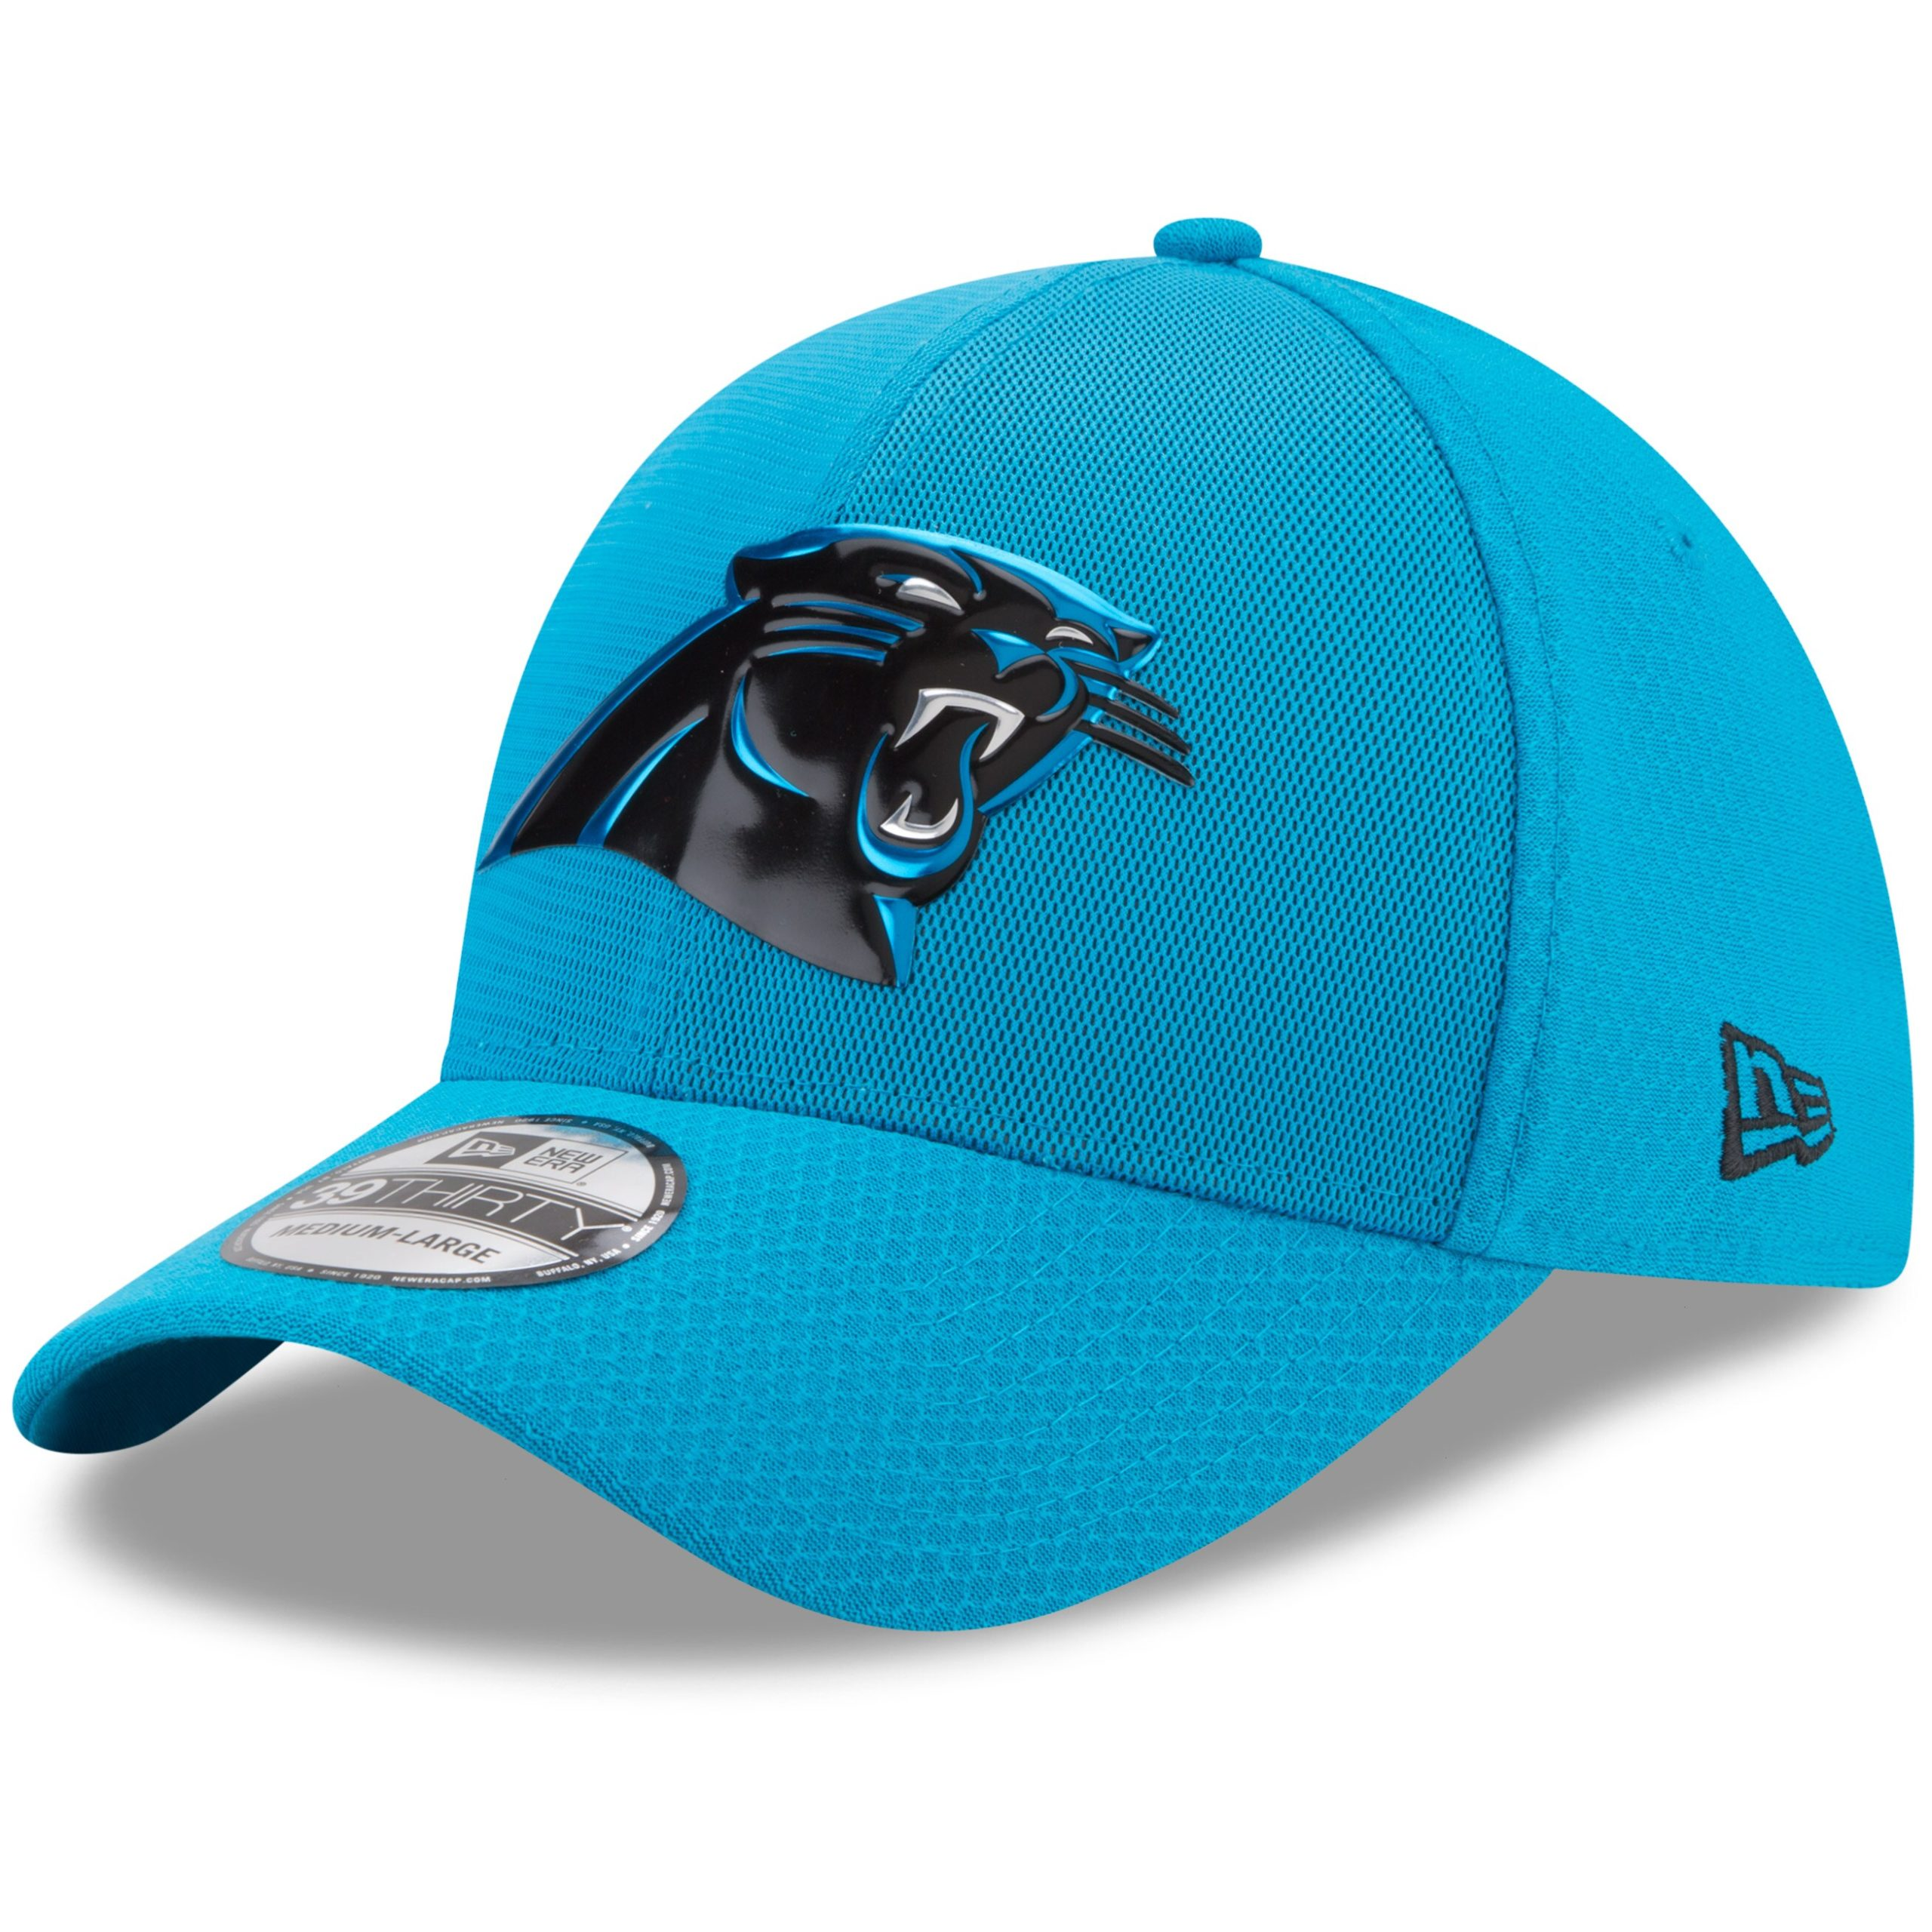 Carolina Panthers New Era 2017 Color Rush 39THIRTY Flex Hat - Blue